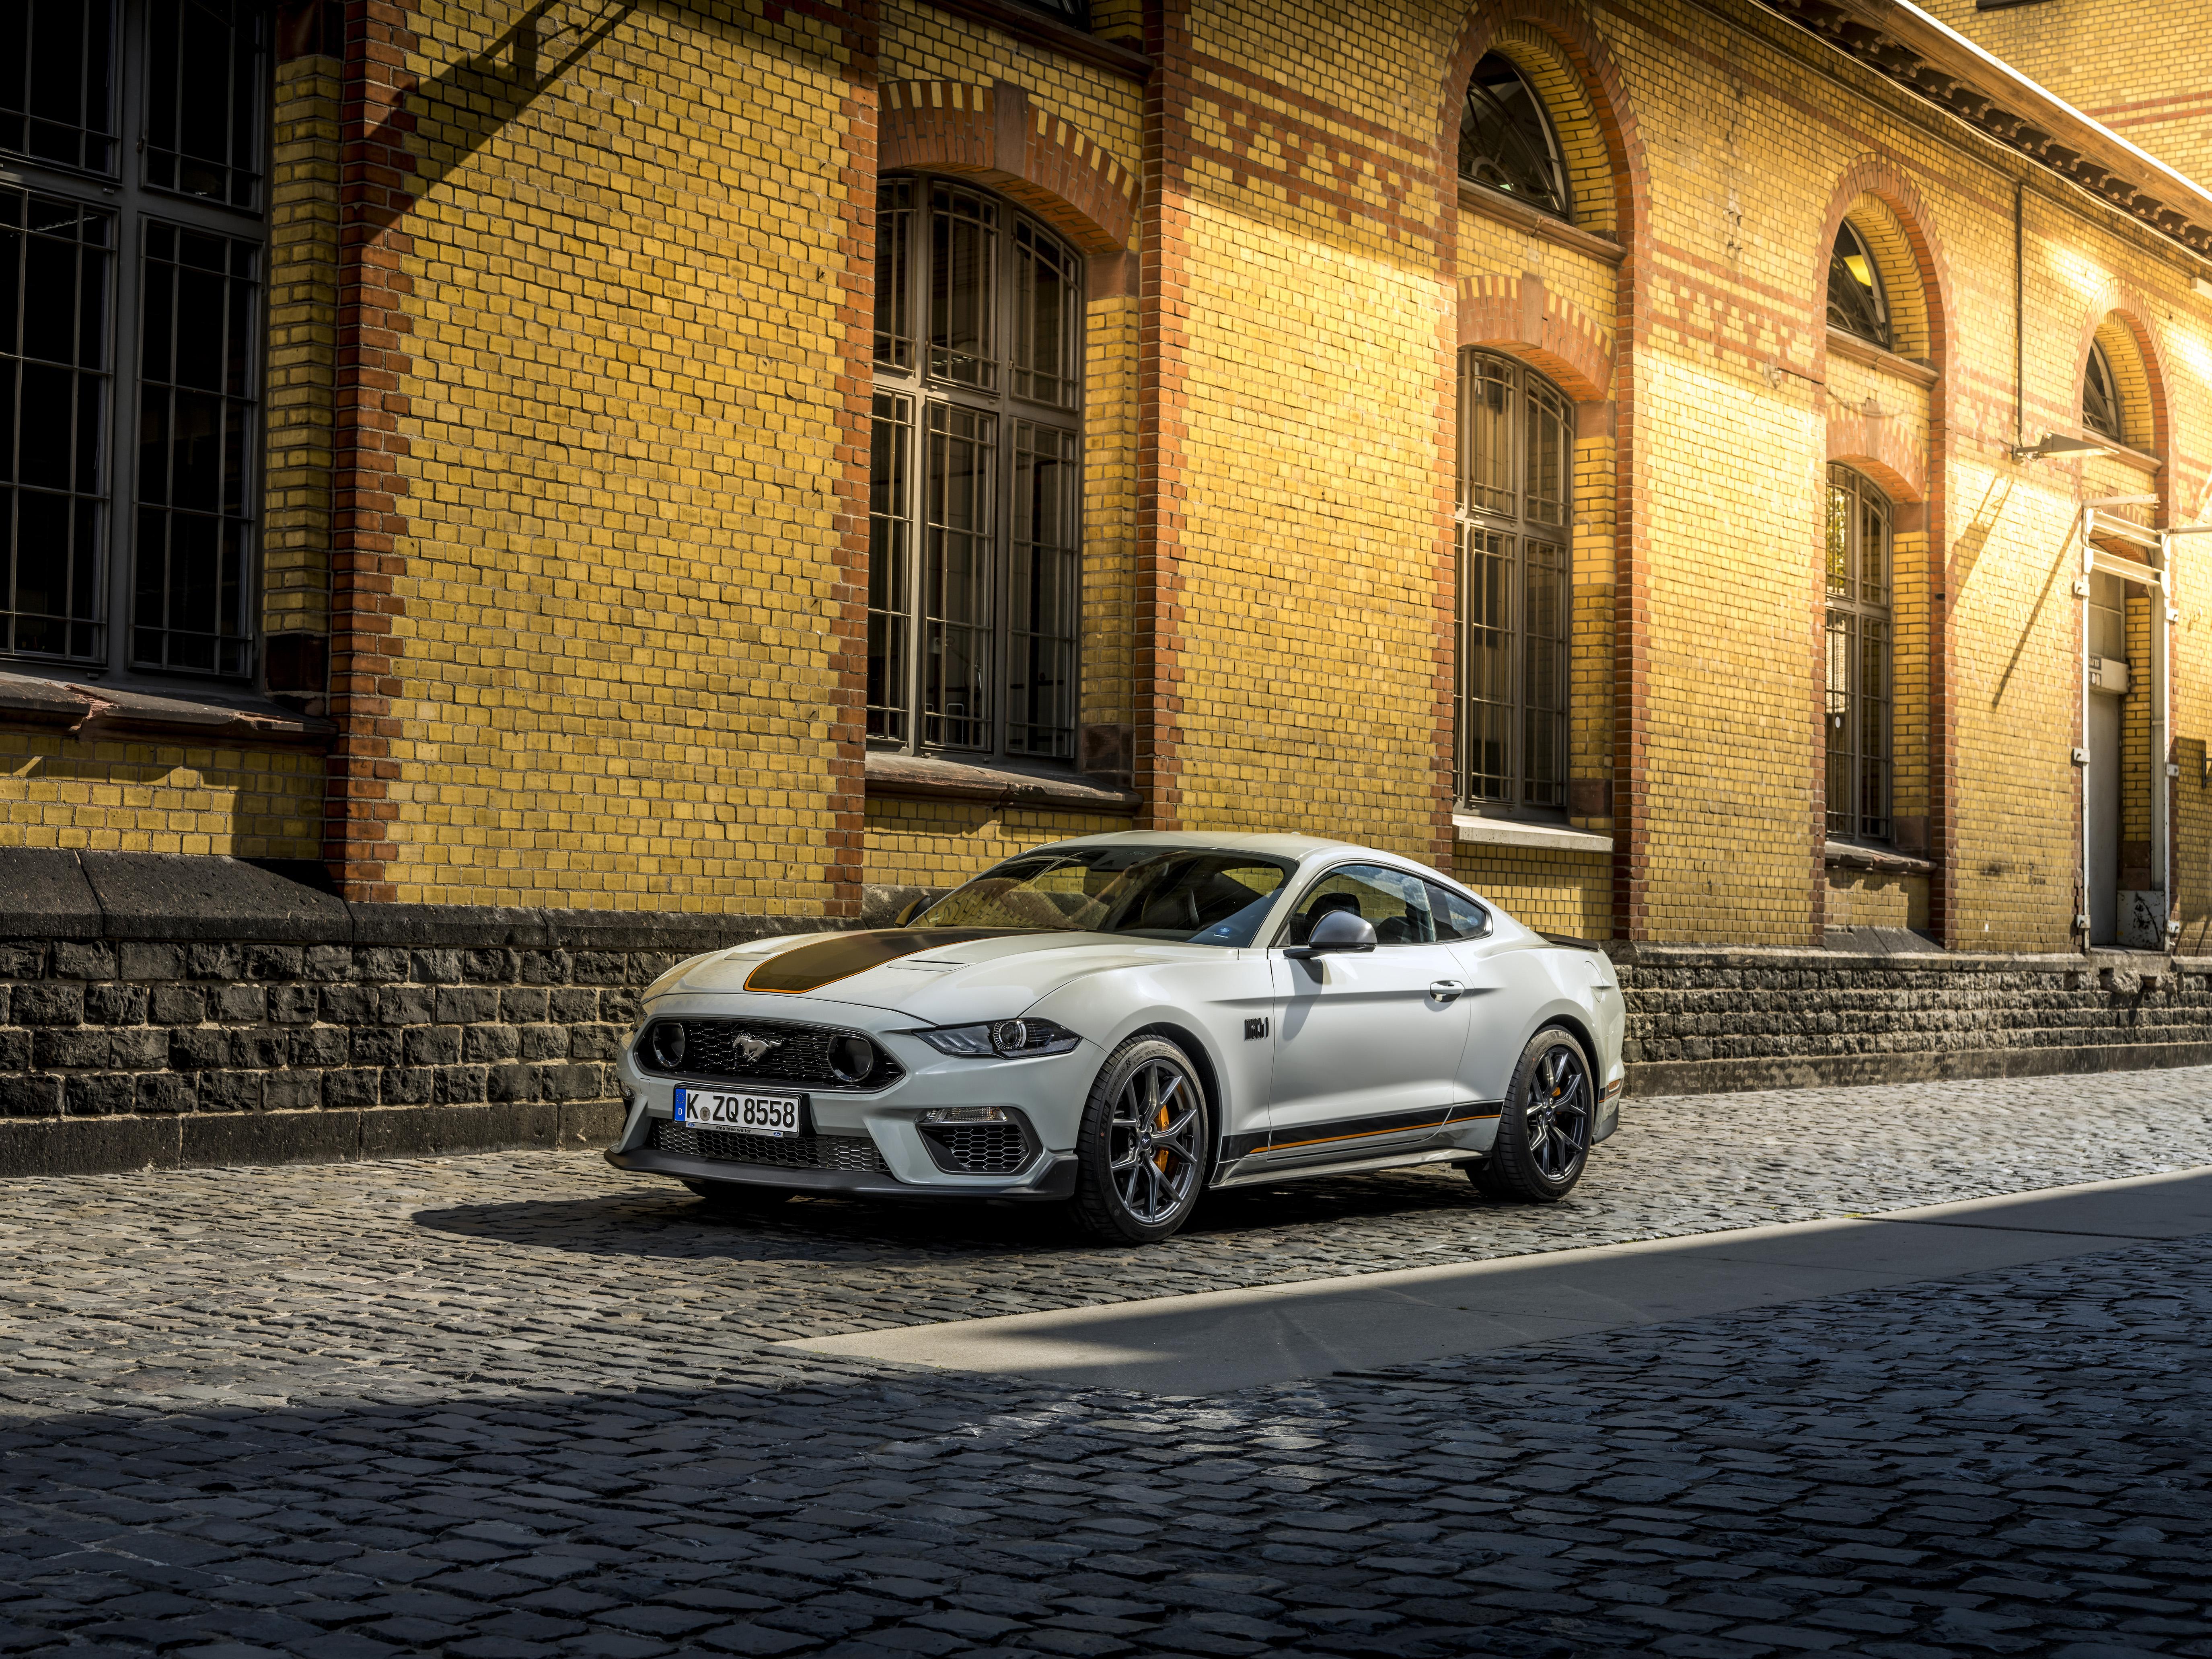 ford mustang mach 1 4k 1608818036 - Ford Mustang Mach 1 4k - Ford Mustang Mach 1 4k wallpapers